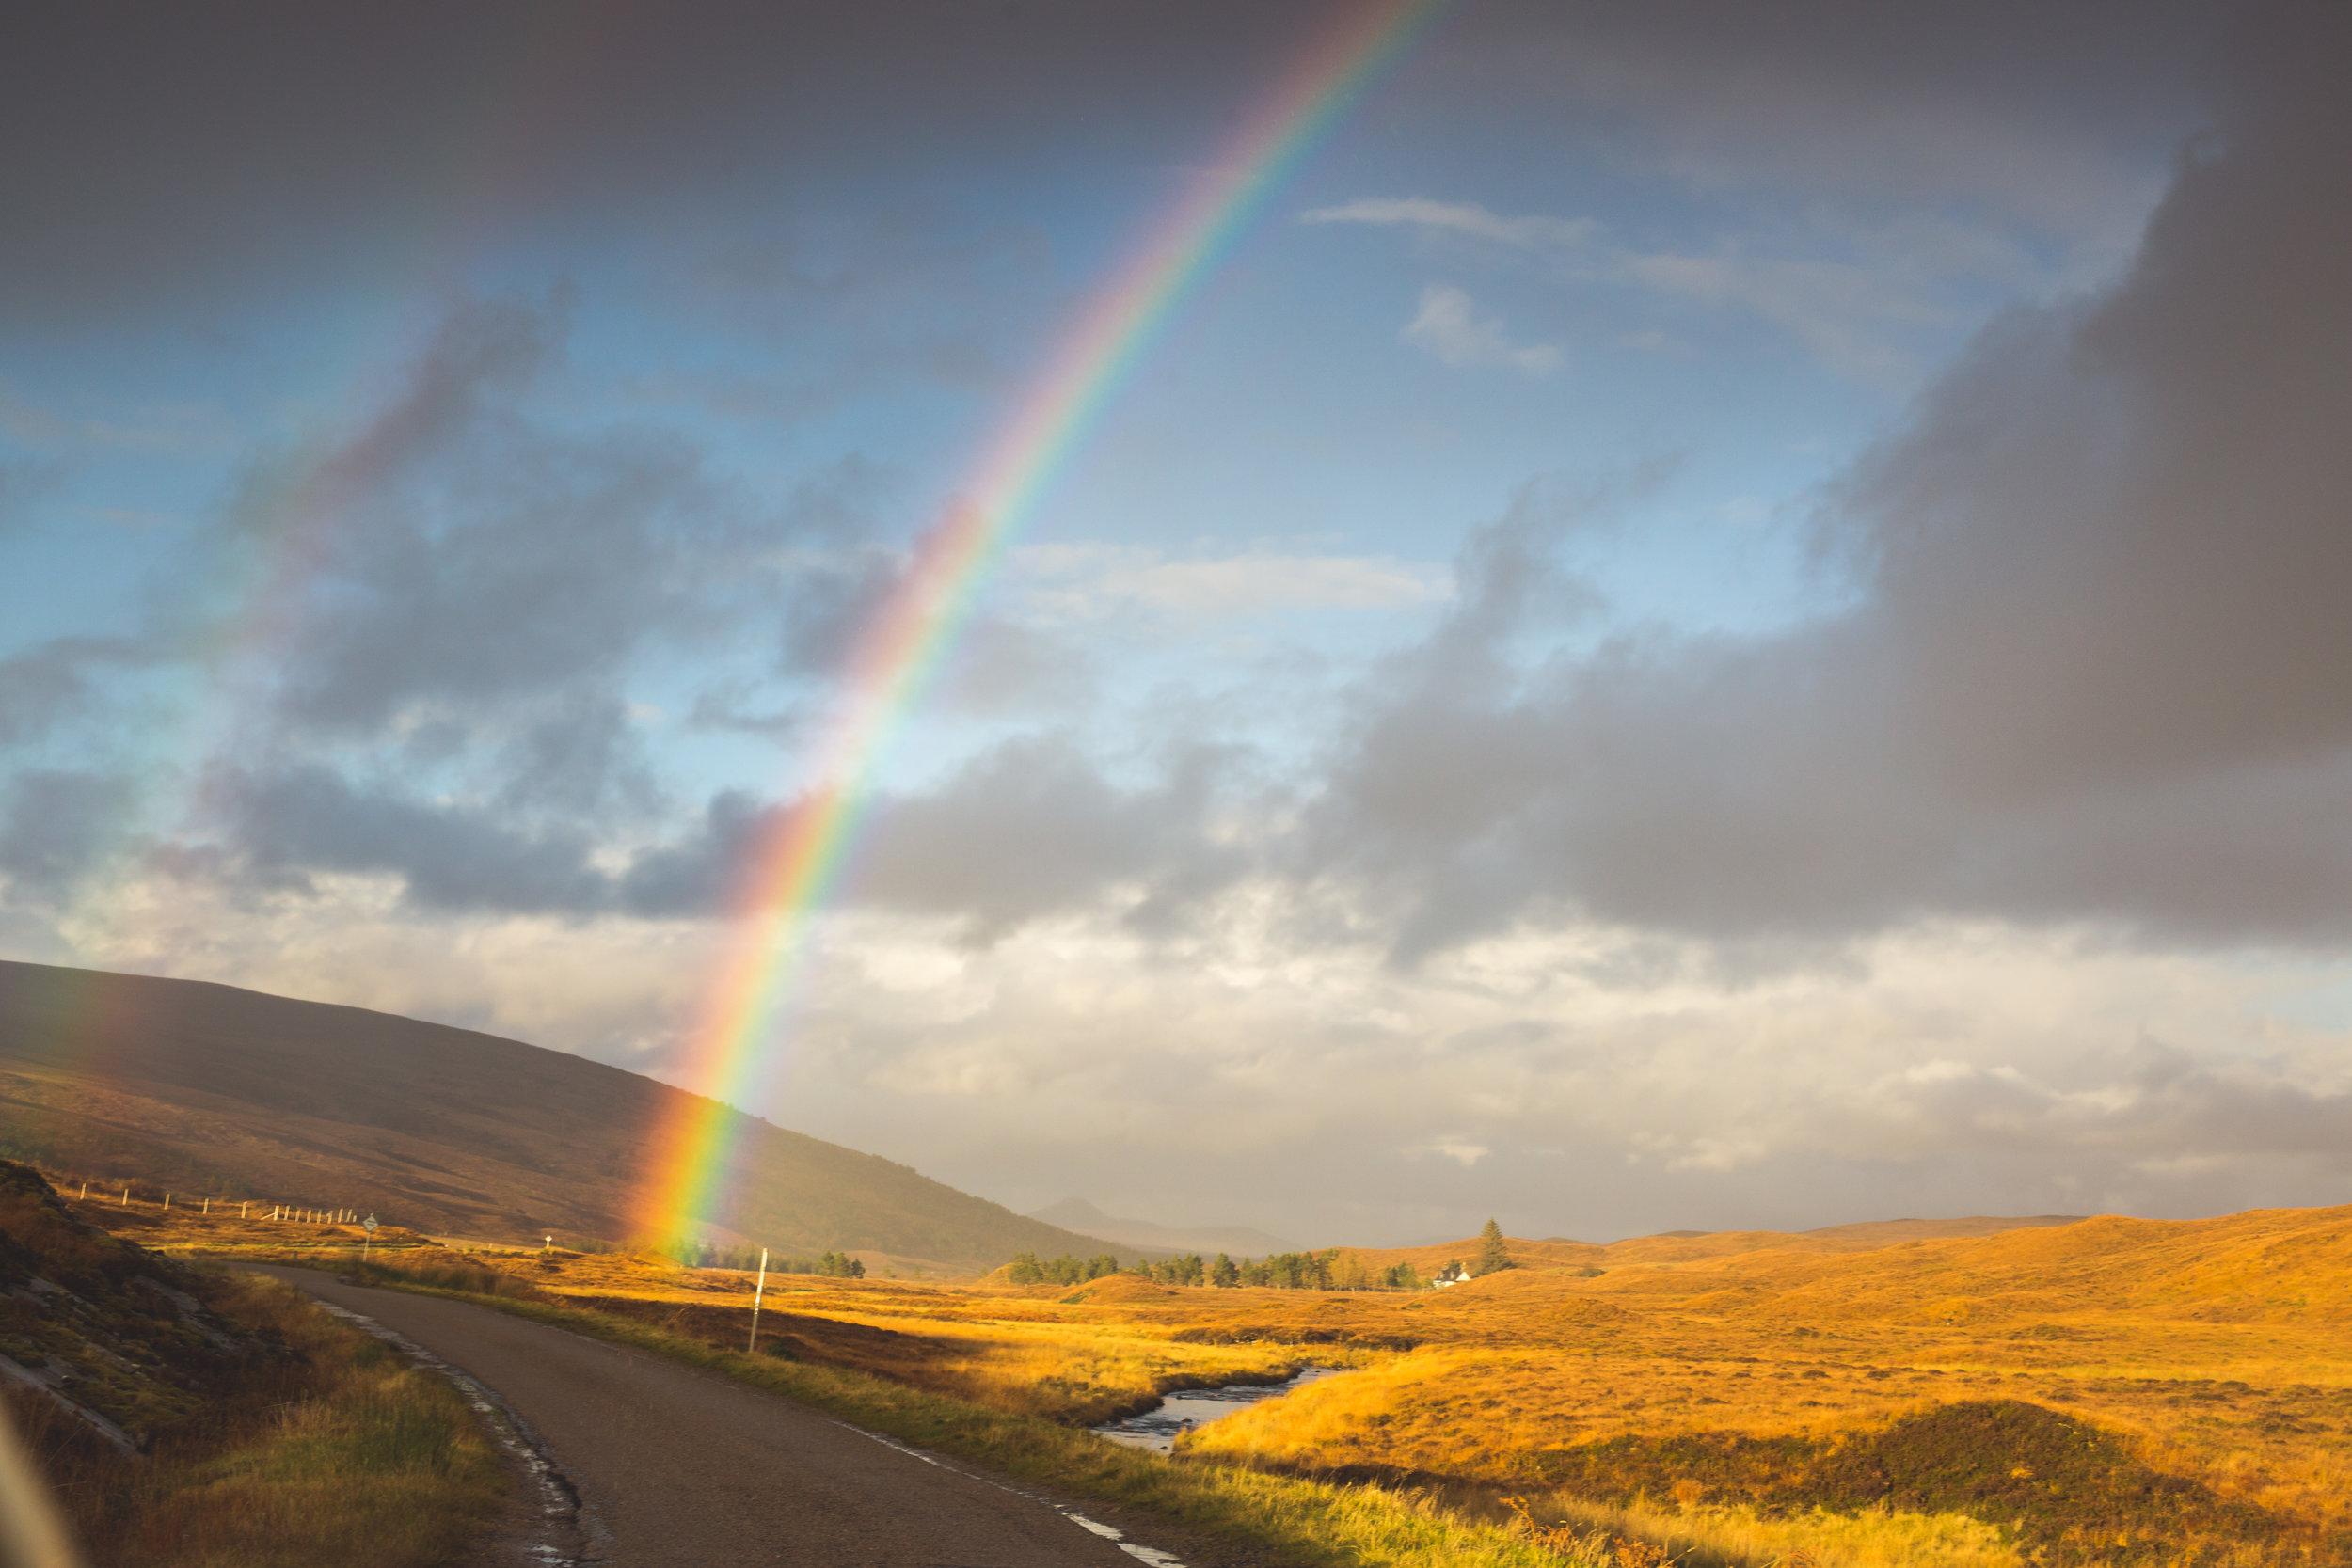 Fraser_Taylor_Scotland-67.jpg